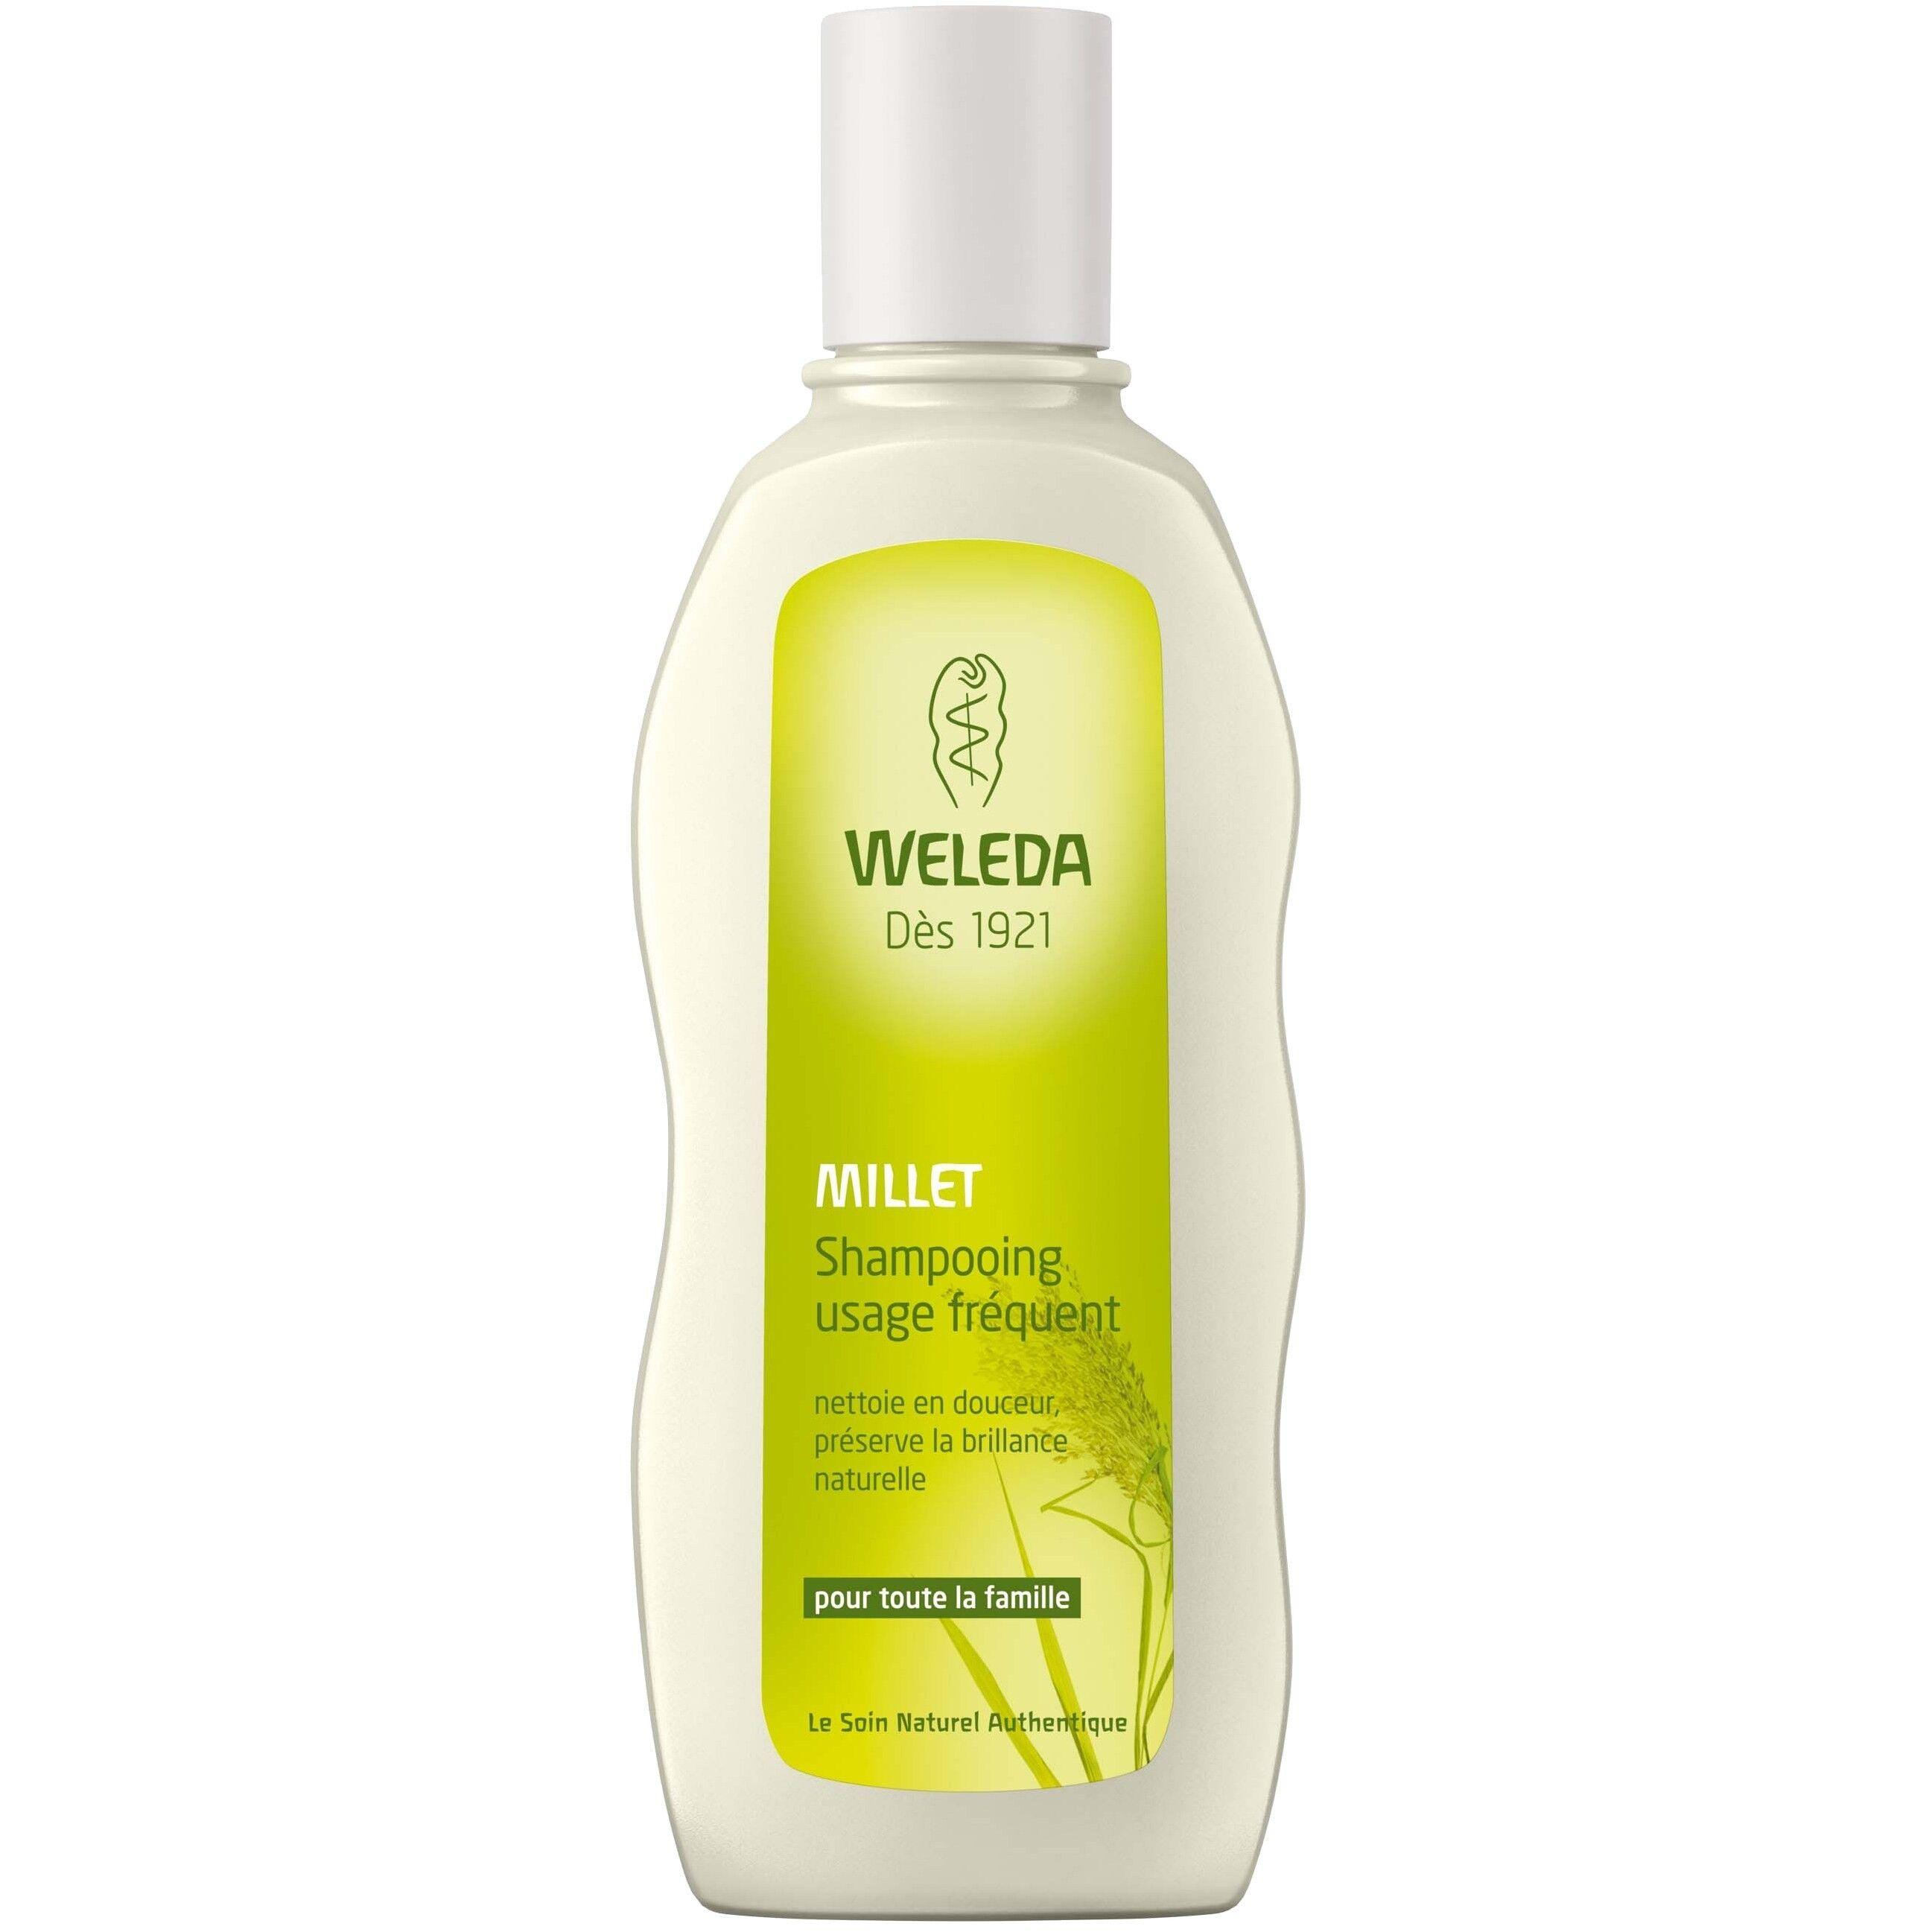 Weleda Shampoing Doux au millet - Usage fréquent 190 ml - Weleda